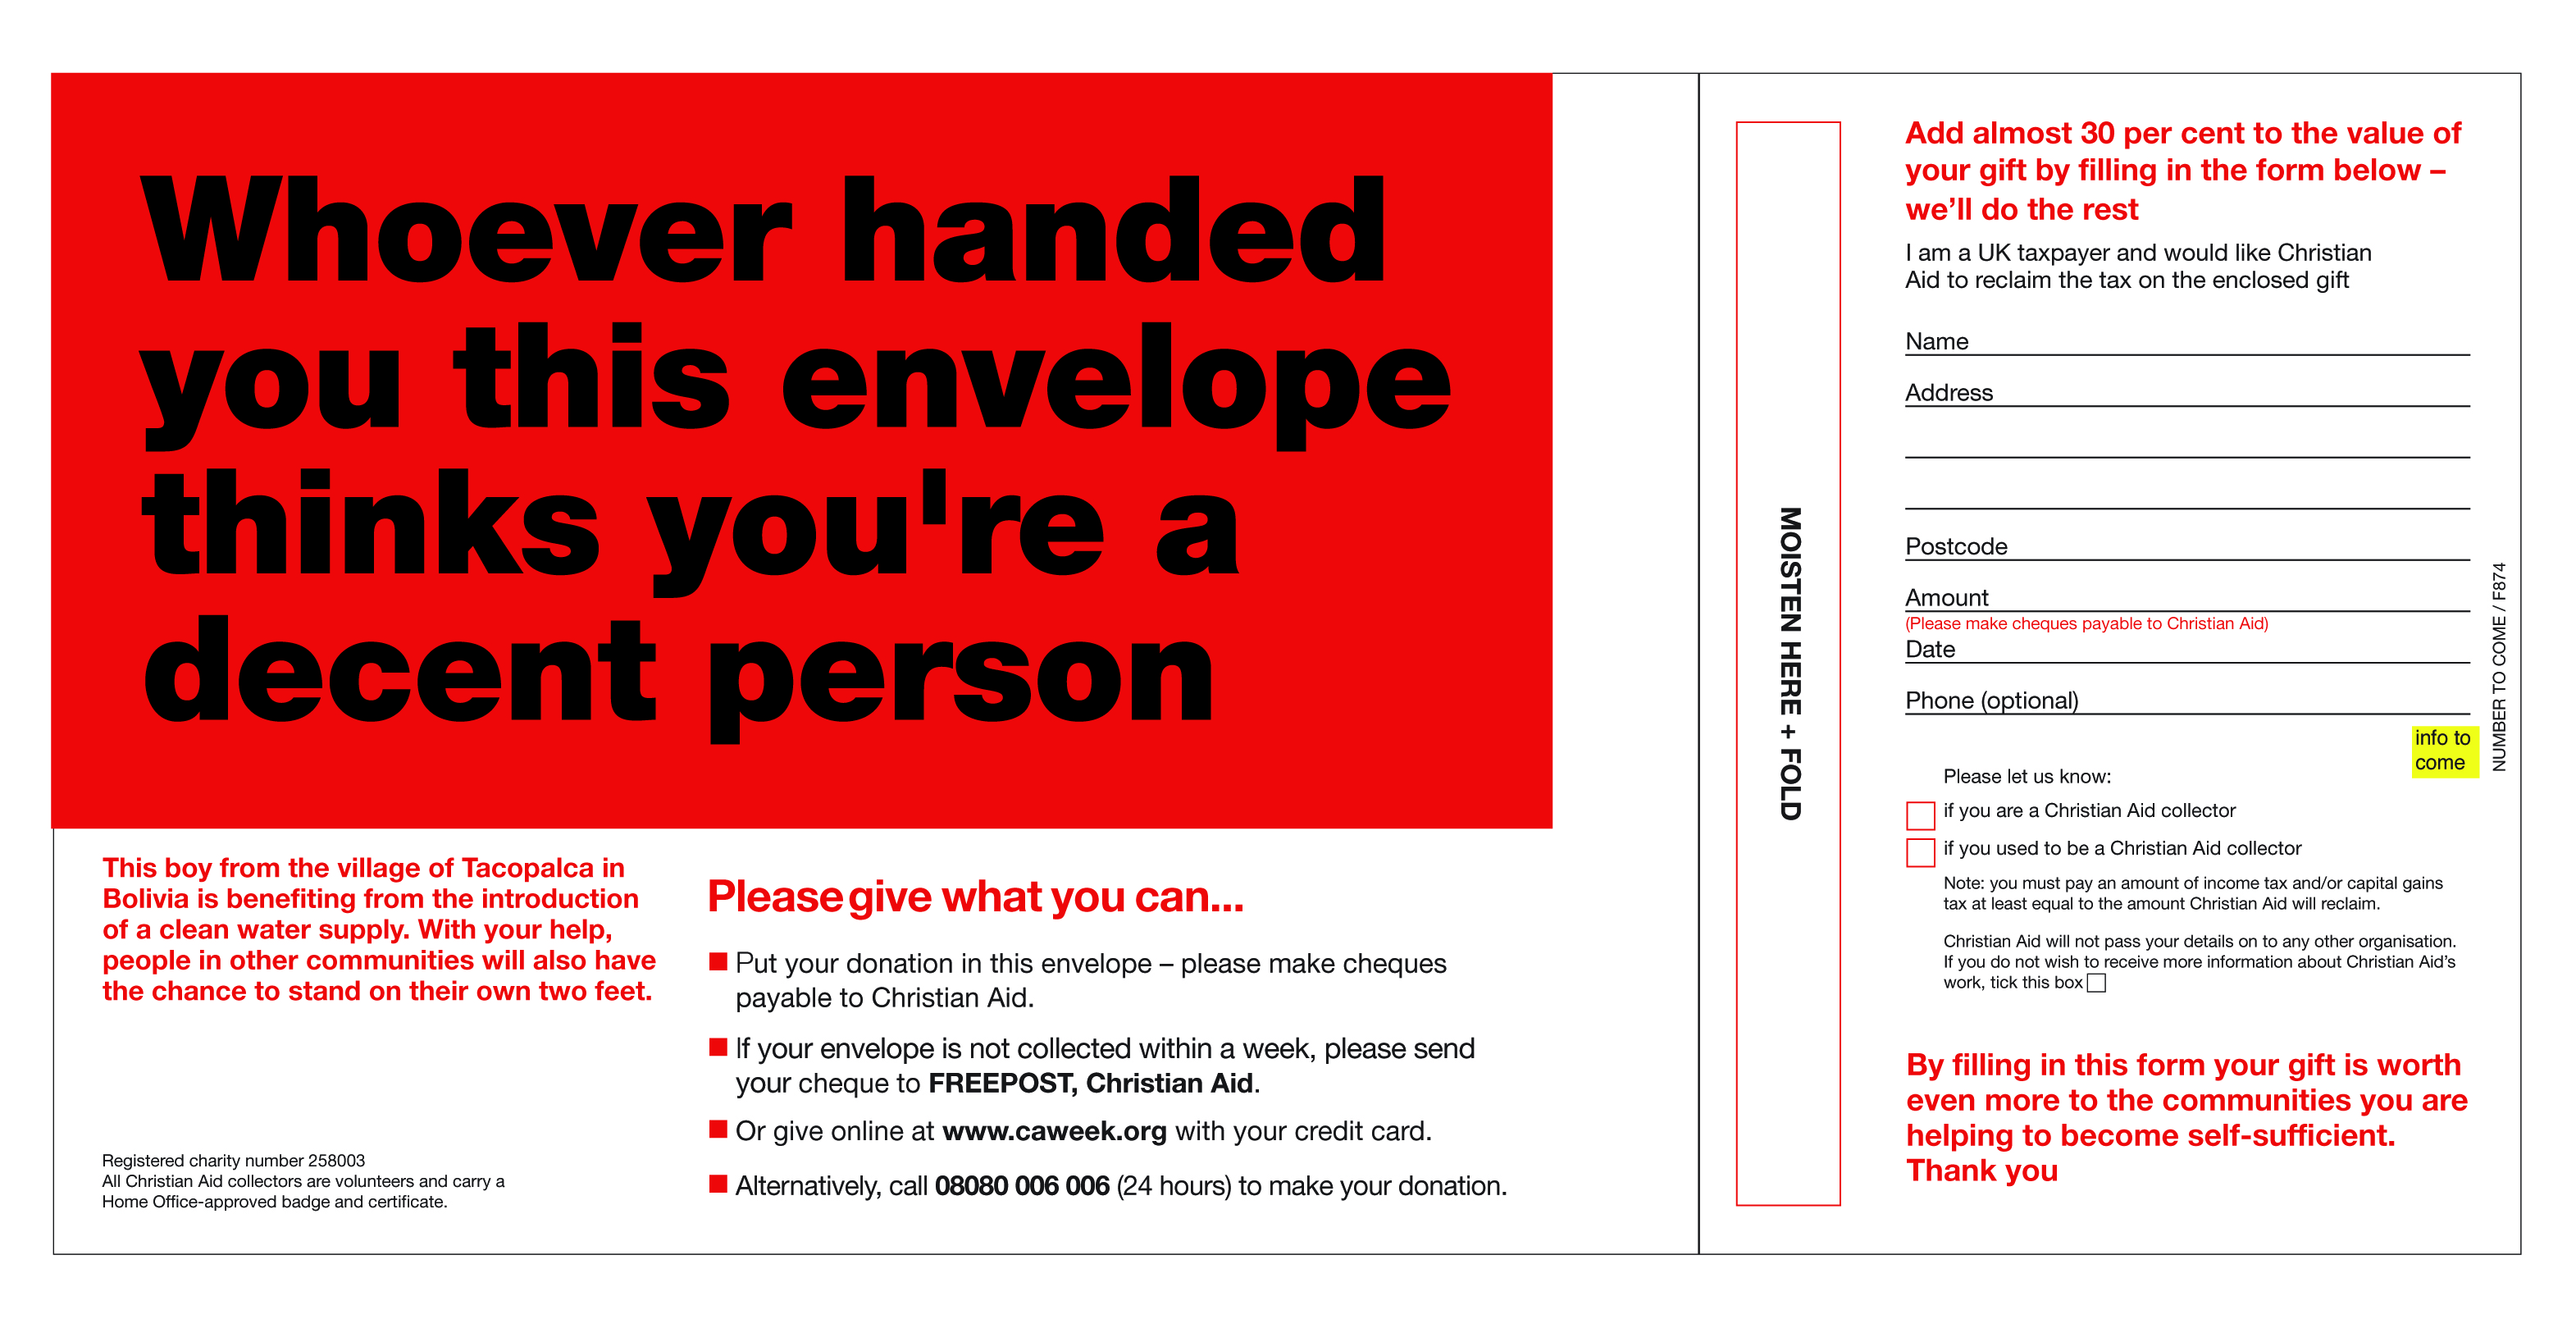 Christian Aid, RED, Envelope, CDD-01.jpg